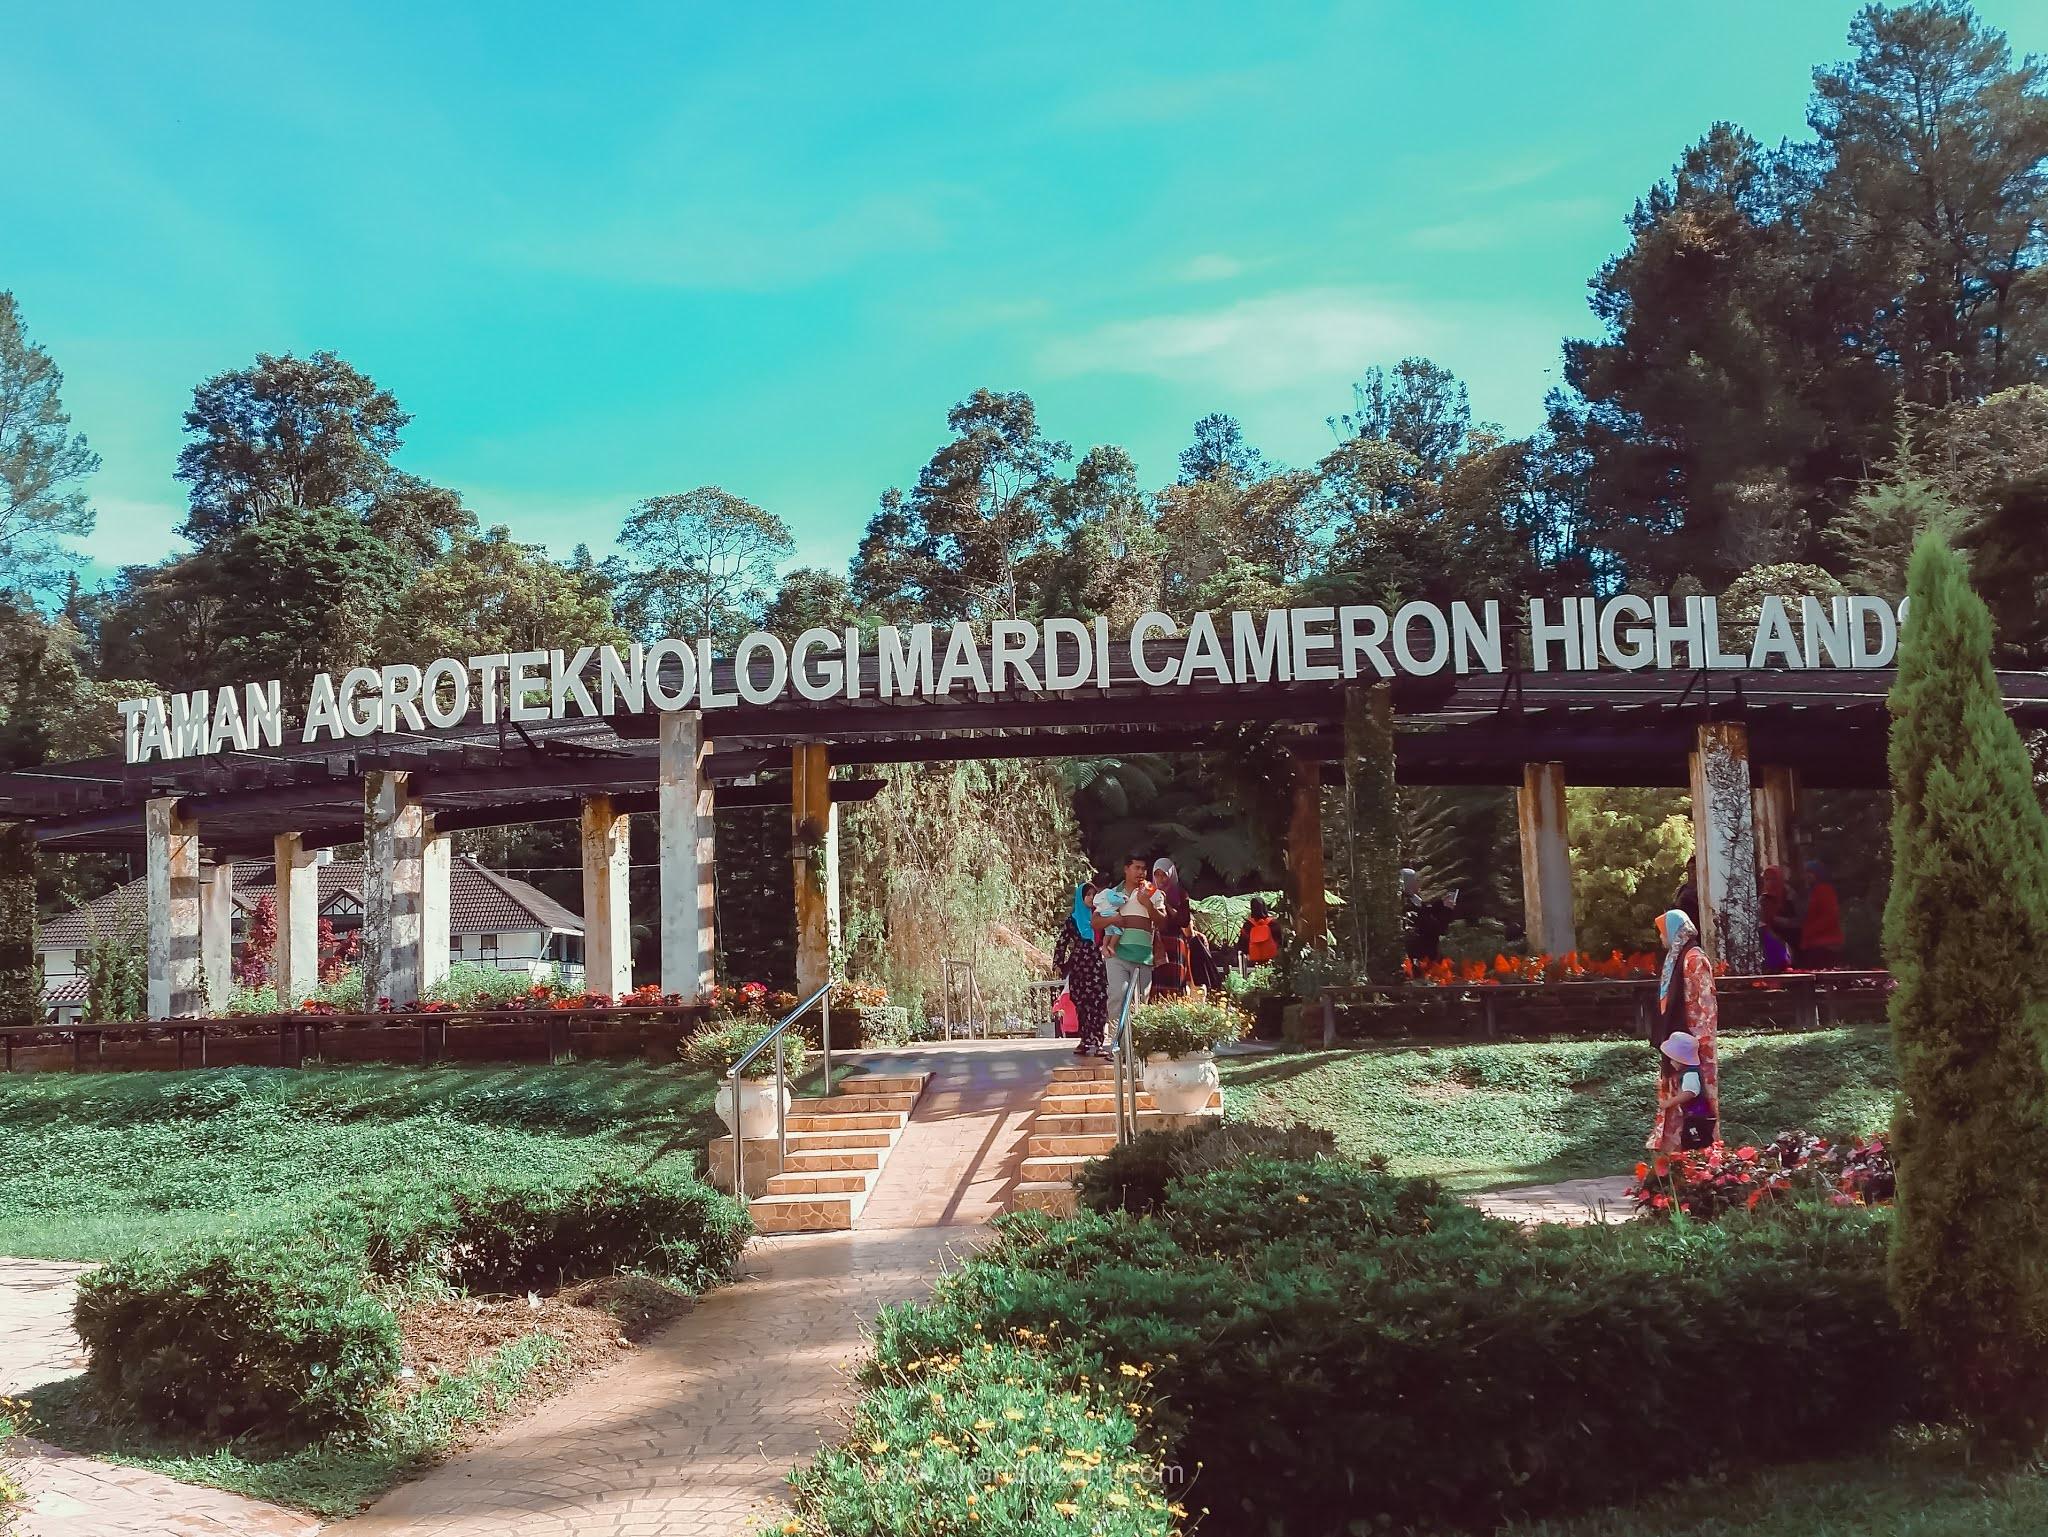 Taman Agroteknologi MARDI, Cameron Highland